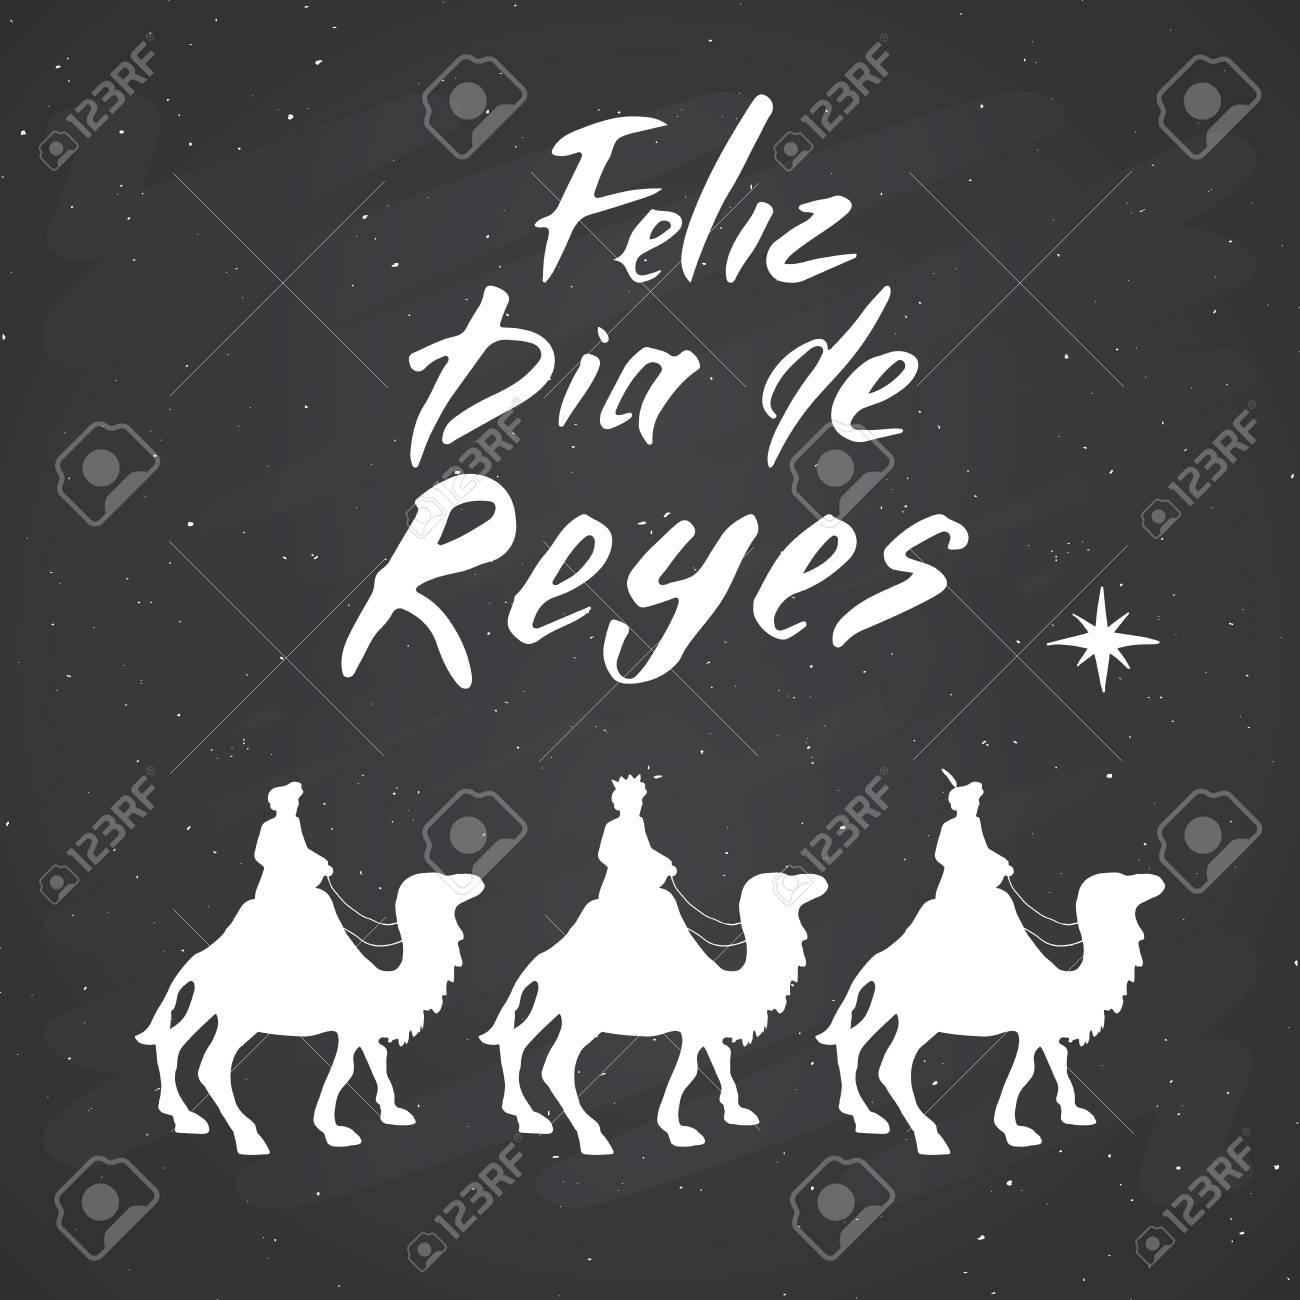 Feliz Dia De Reyes Fotos.Feliz Dia De Reyes Happy Day Of Kings Calligraphic Lettering